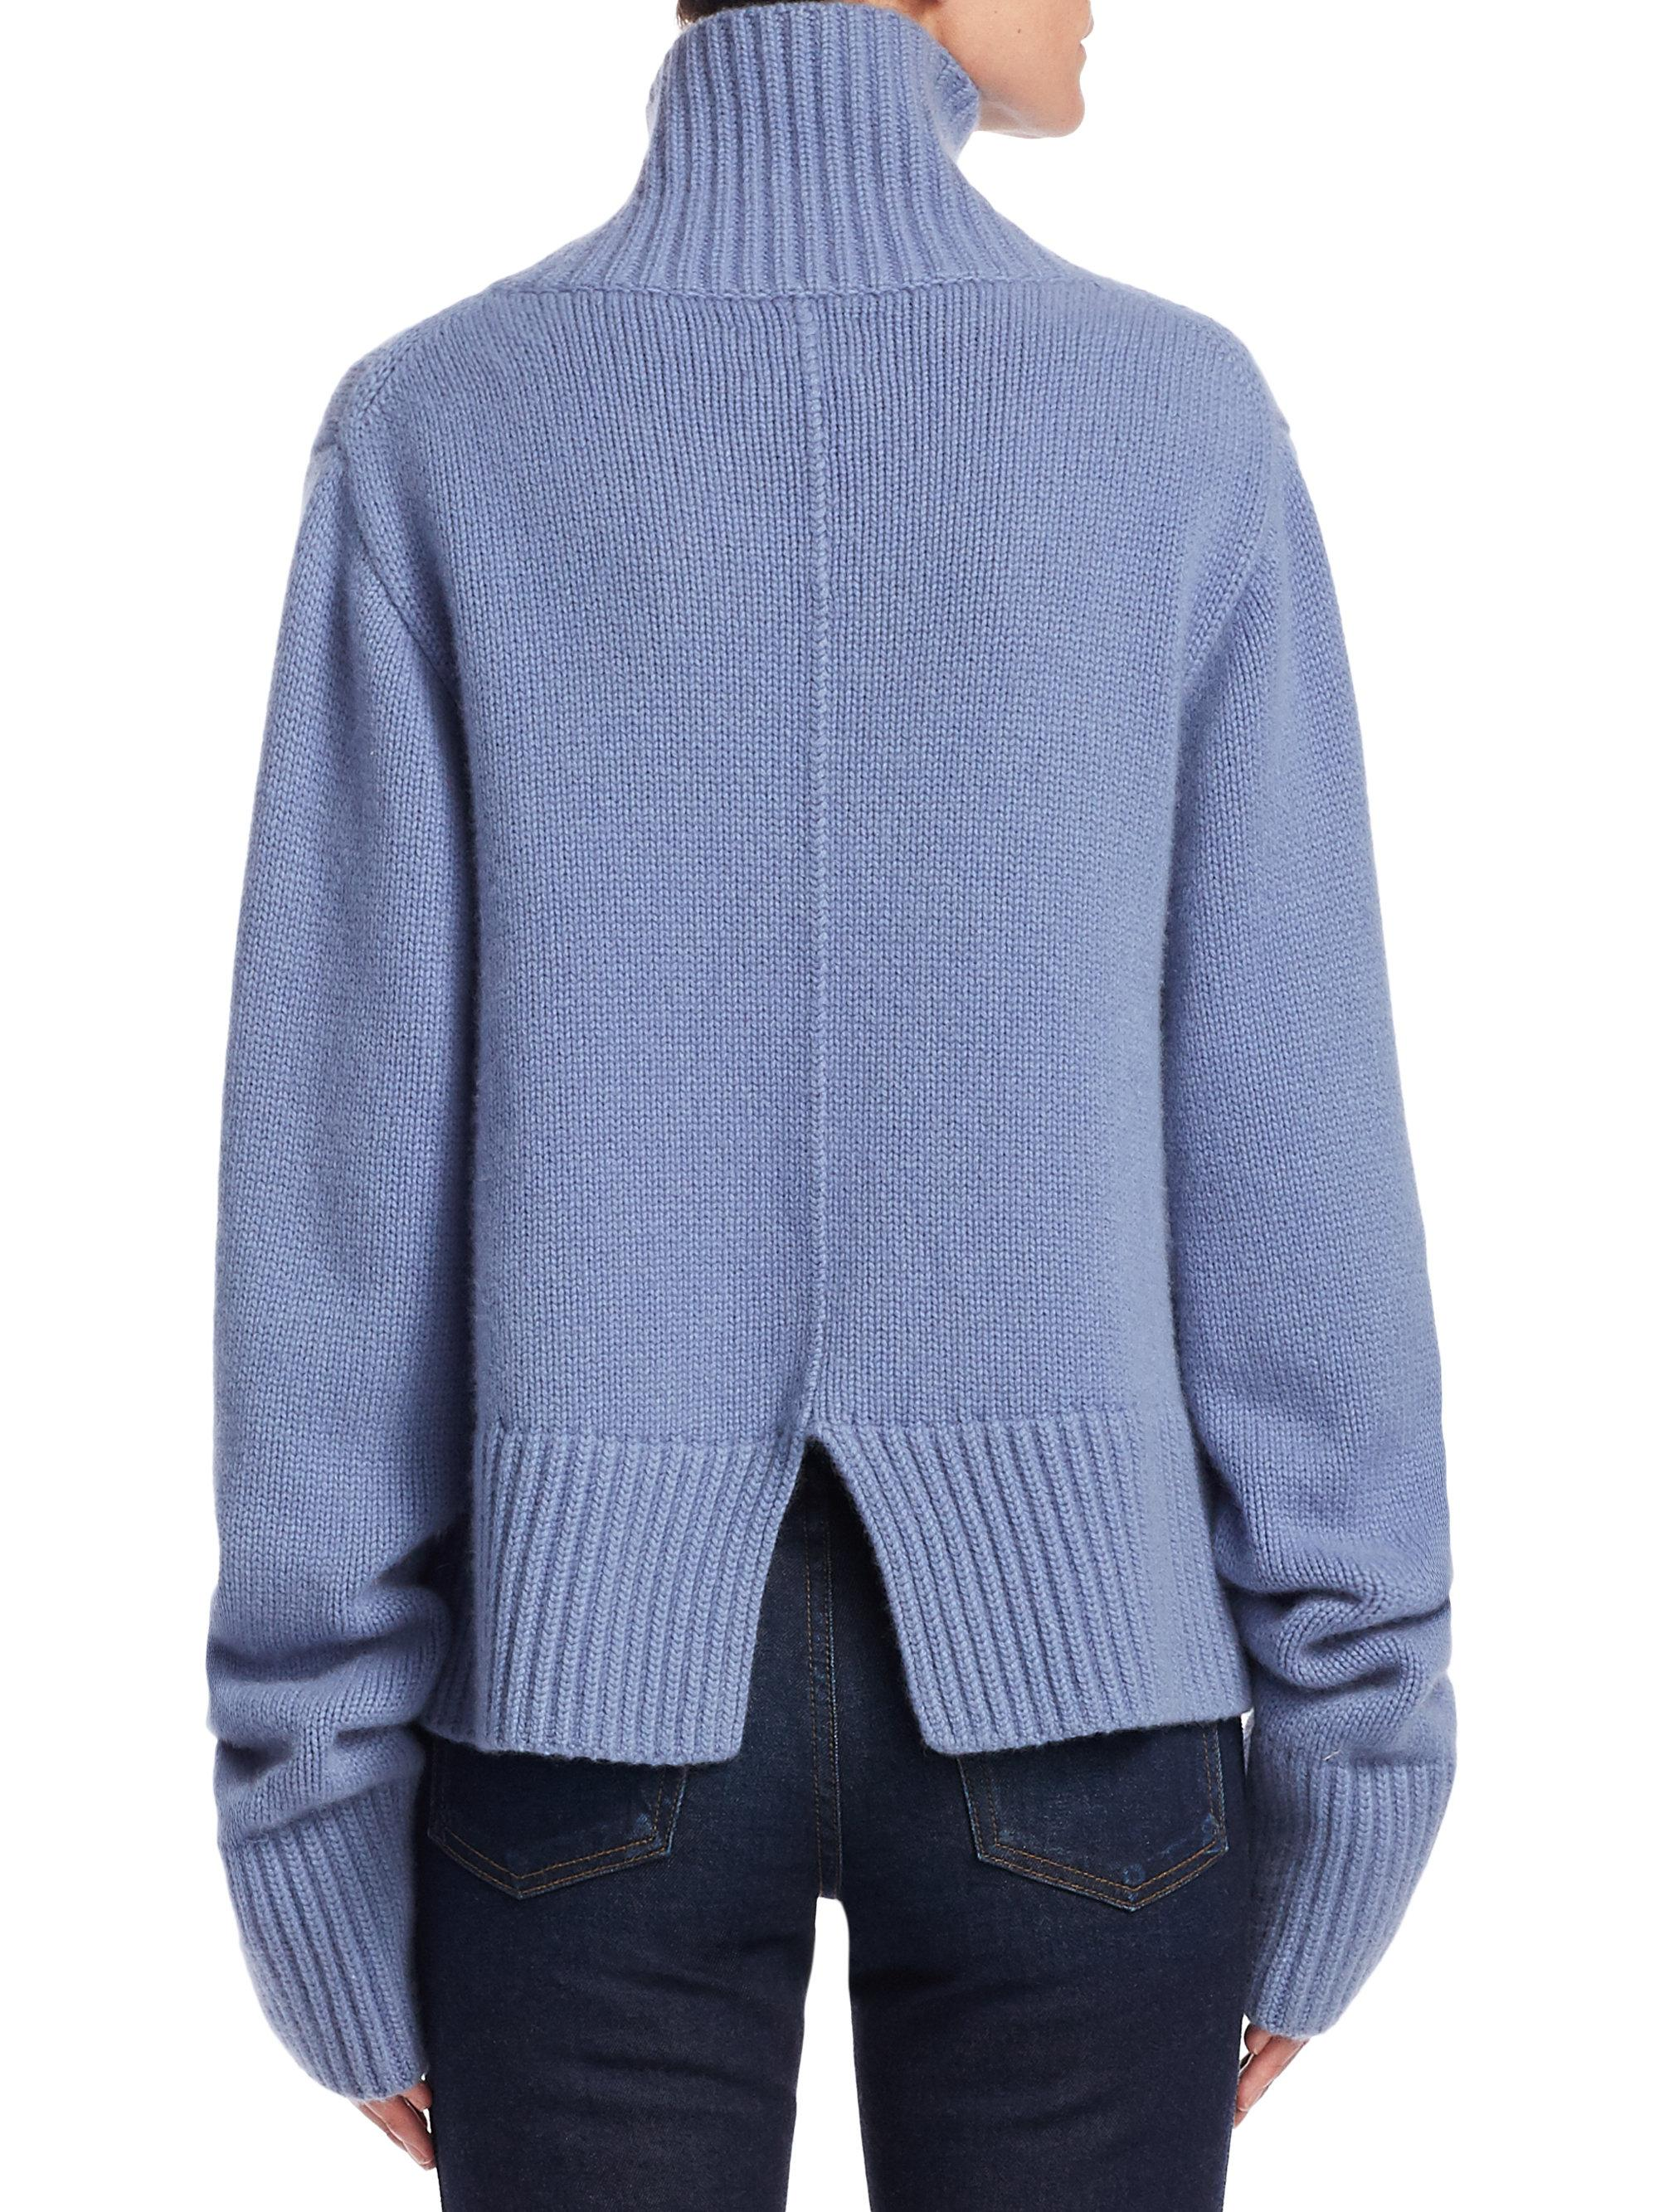 Khaite Wallis Cashmere Turtleneck Sweater in Blue | Lyst